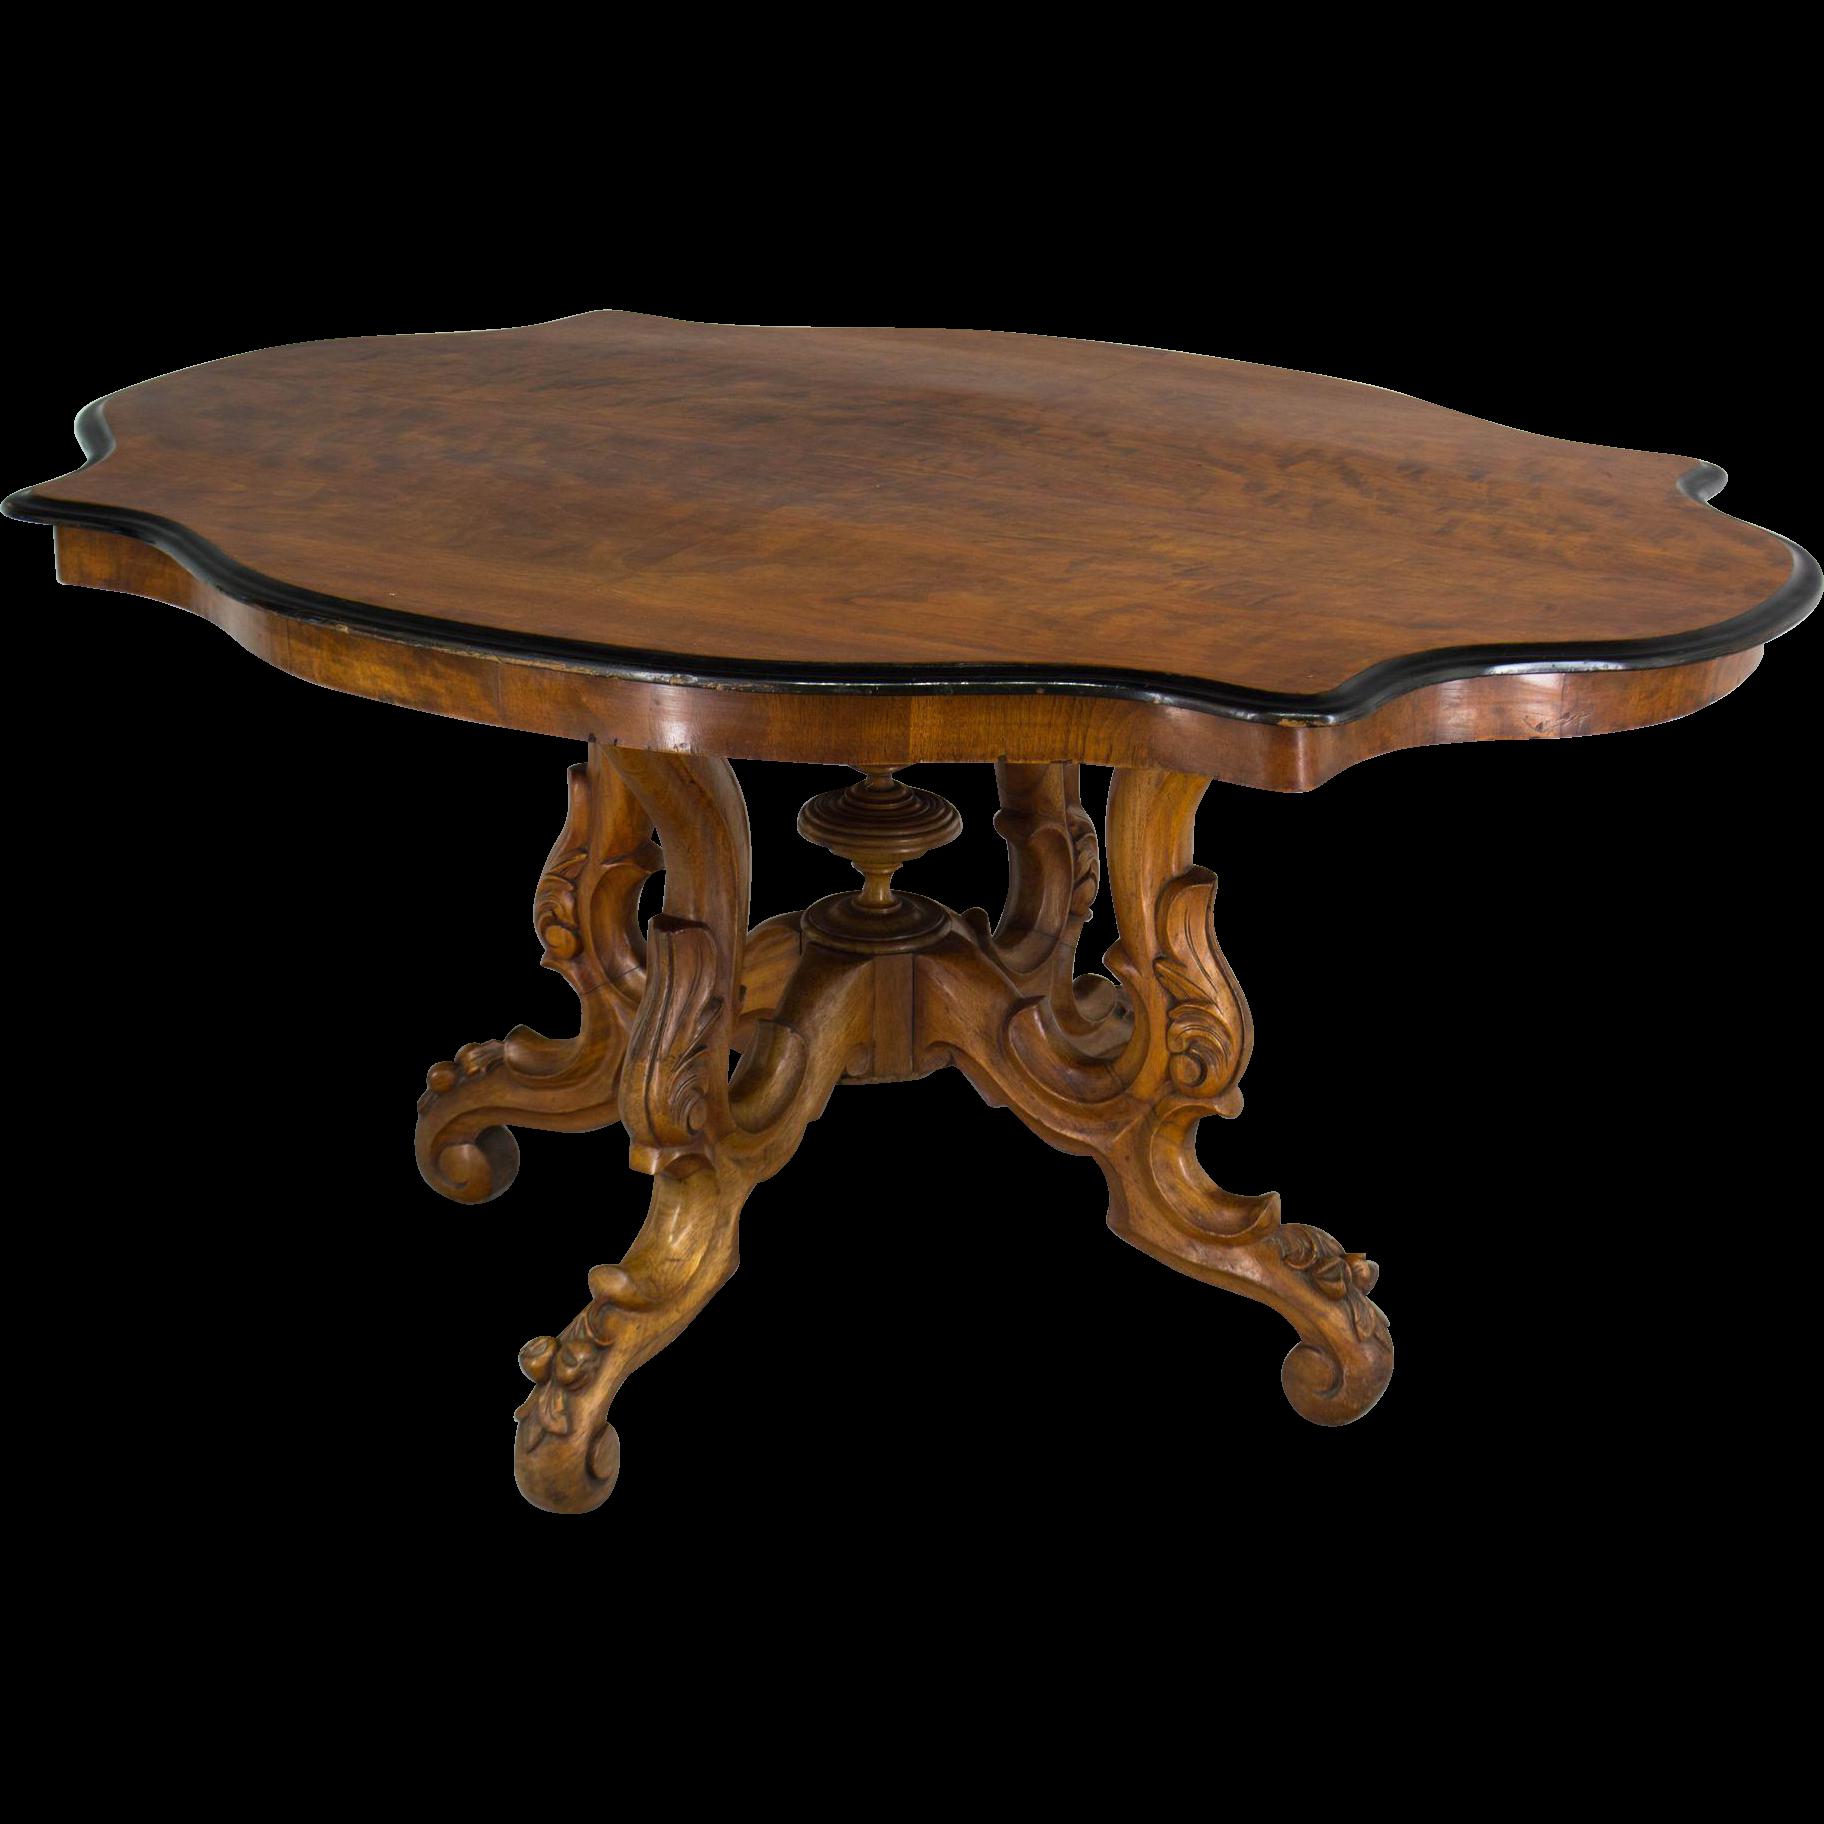 19th c. Napoleon III Gueridon or Center Table